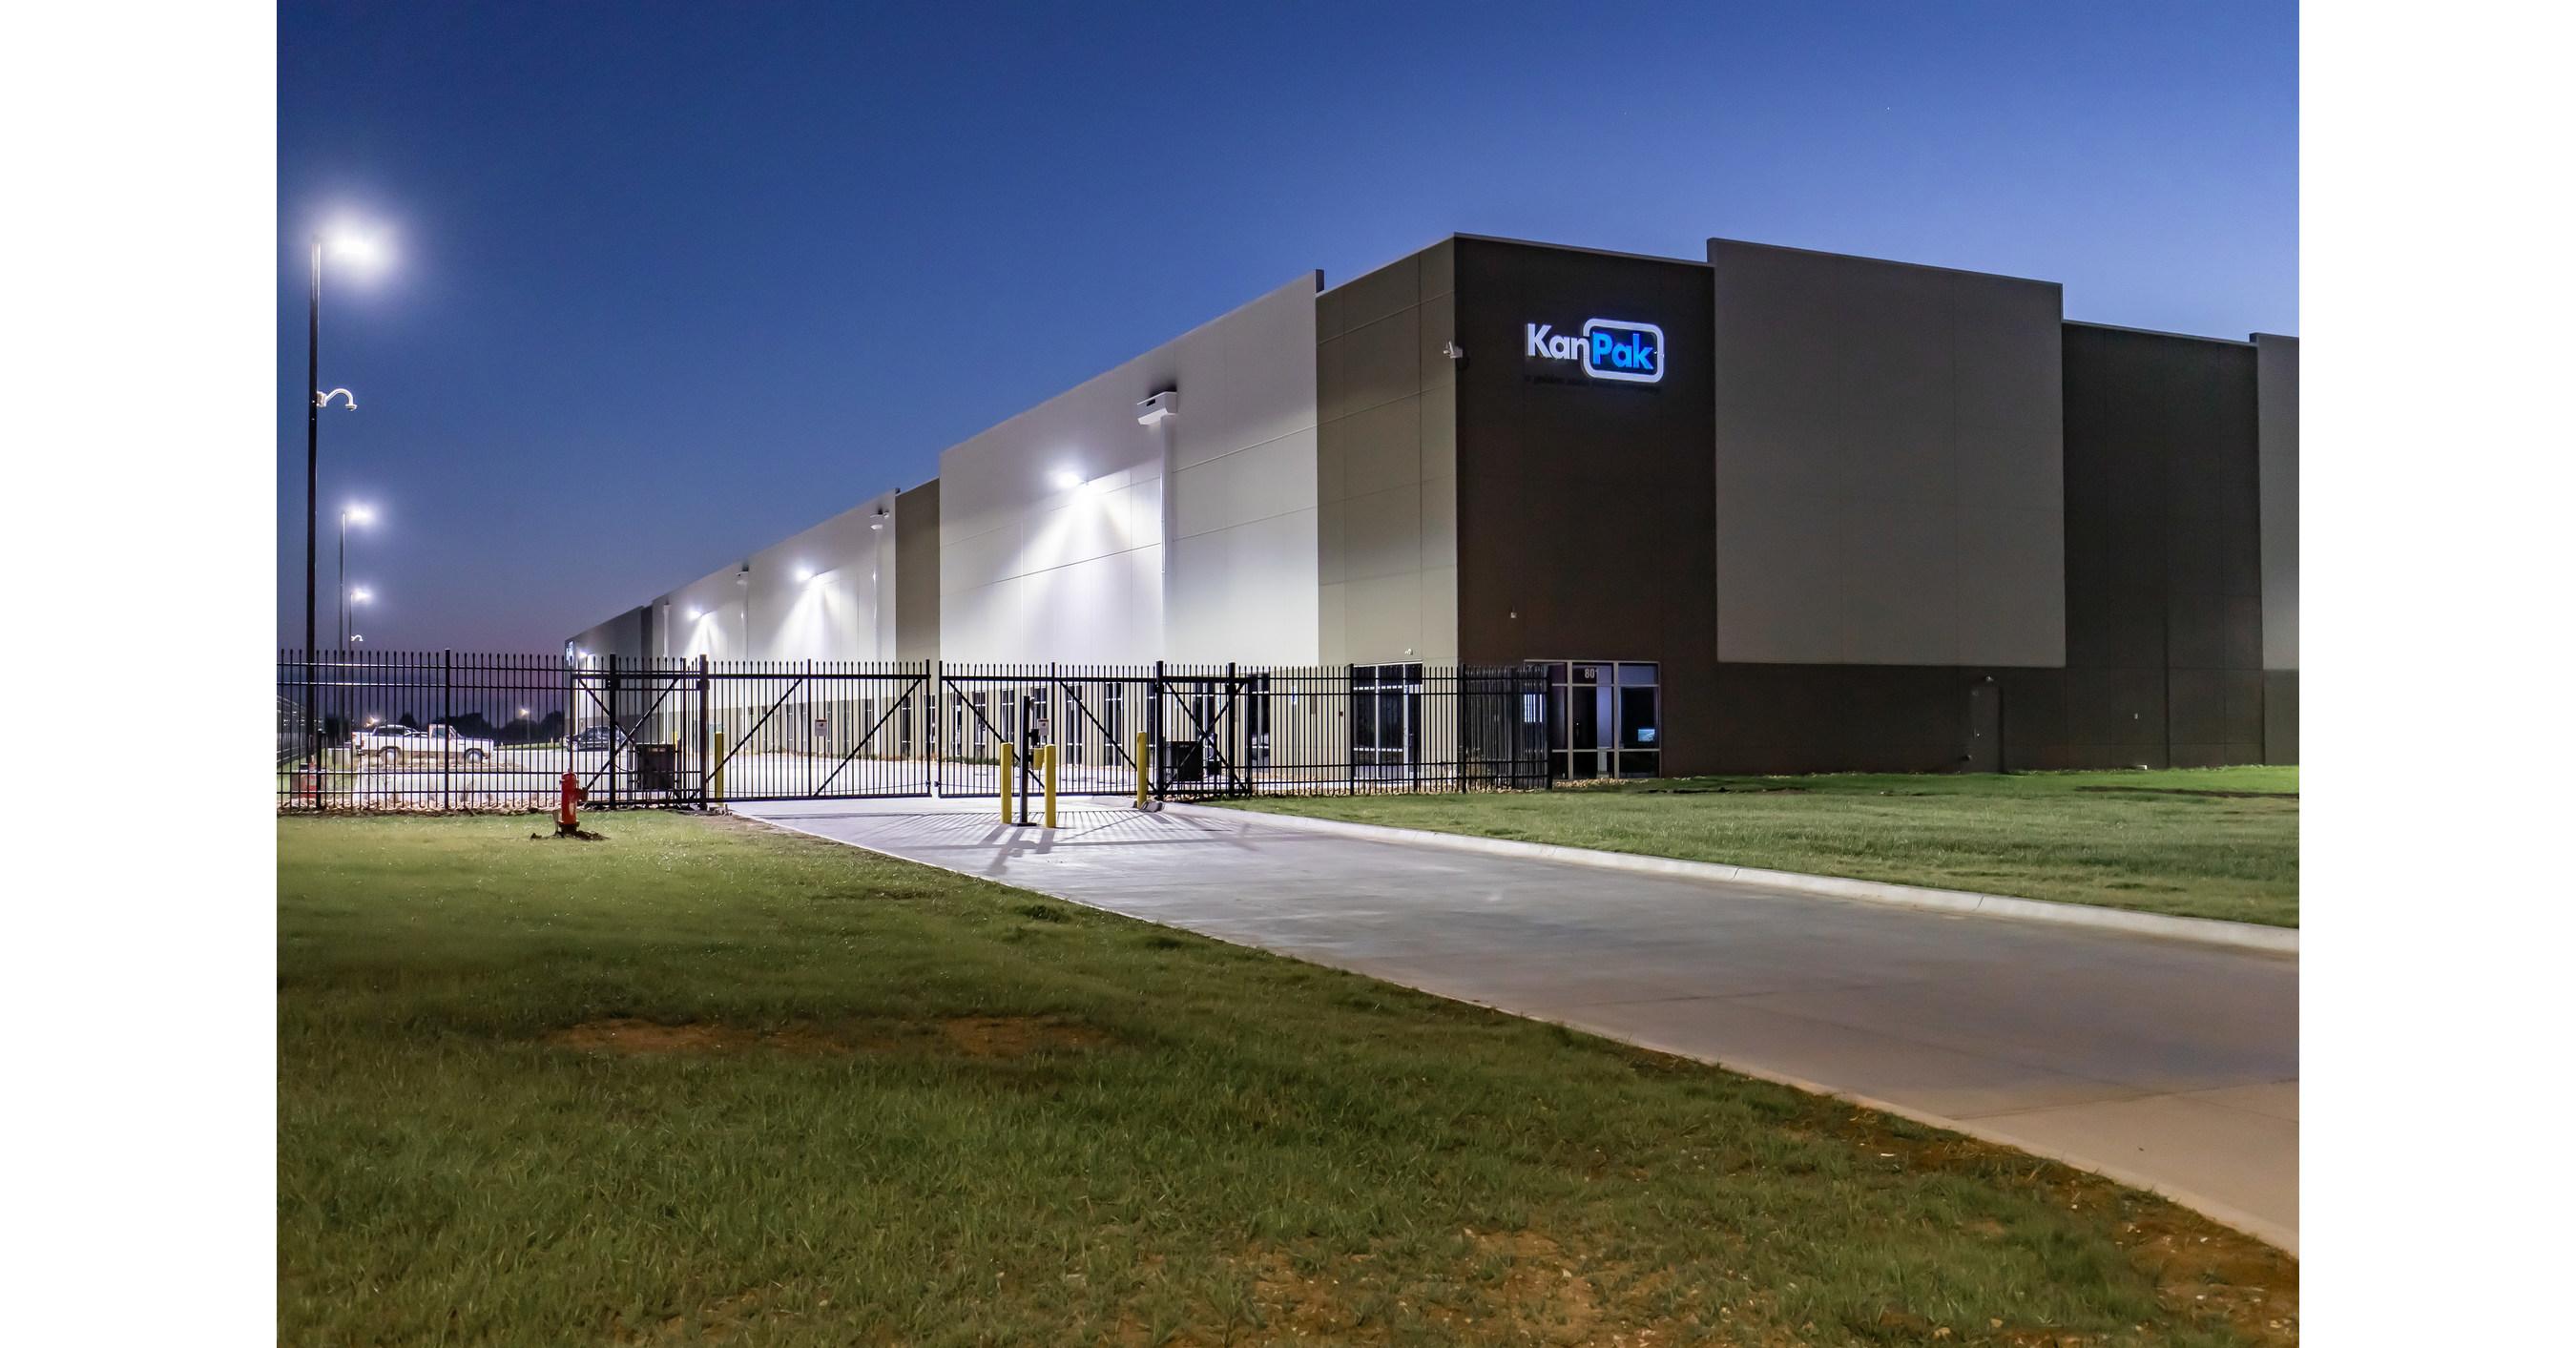 KanPak | Arkansas City, KS | ARCO National Construction